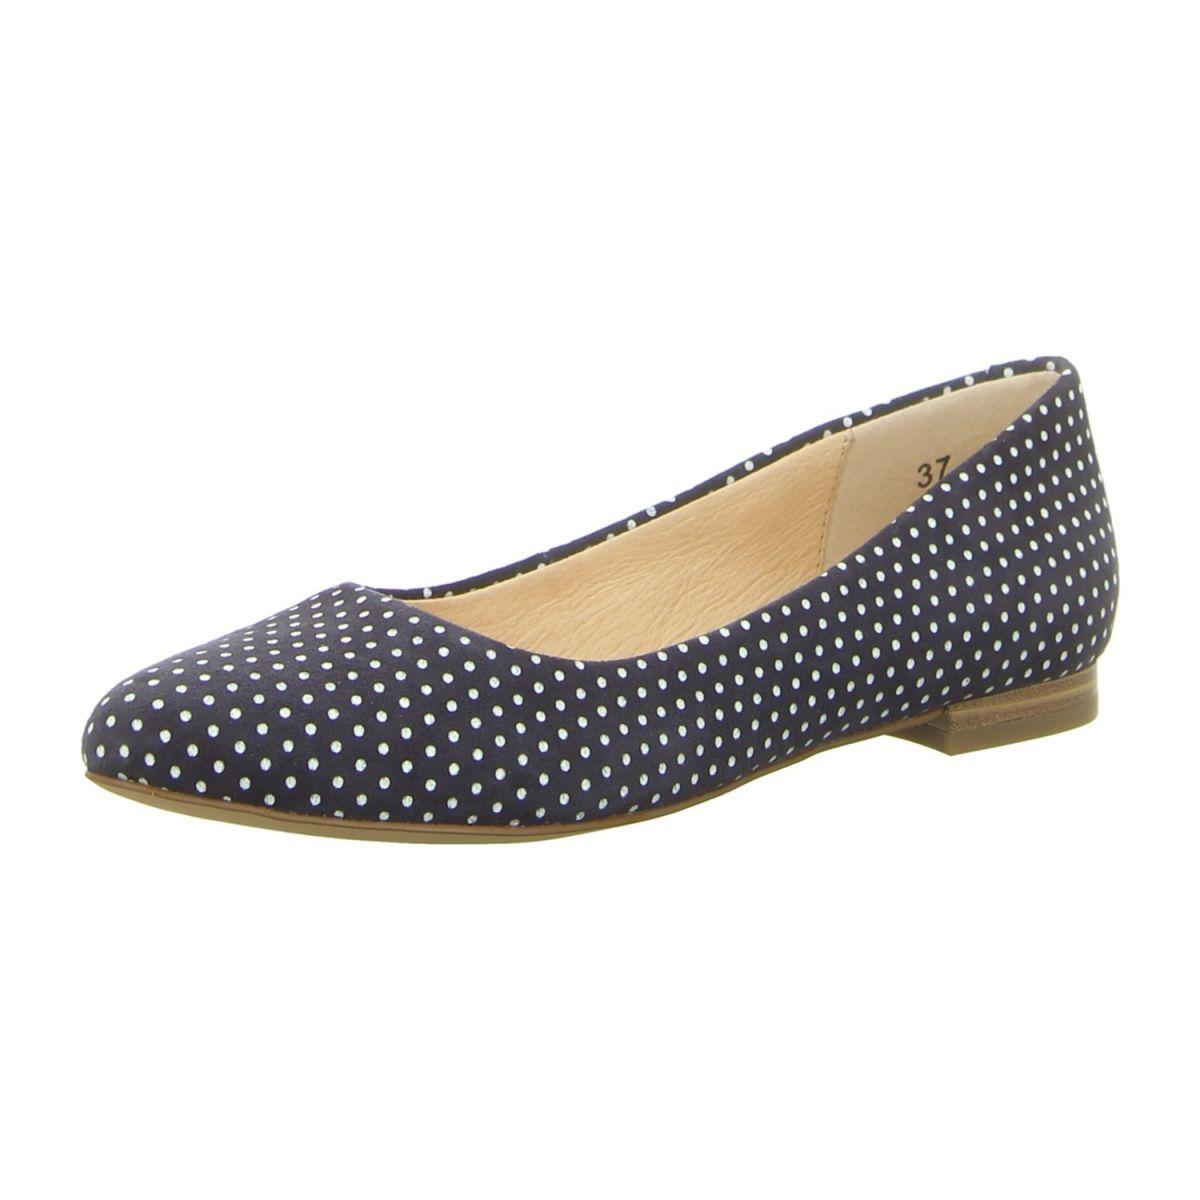 NEU: Caprice Ballerinas 9 9 22107 20 811 navy dots